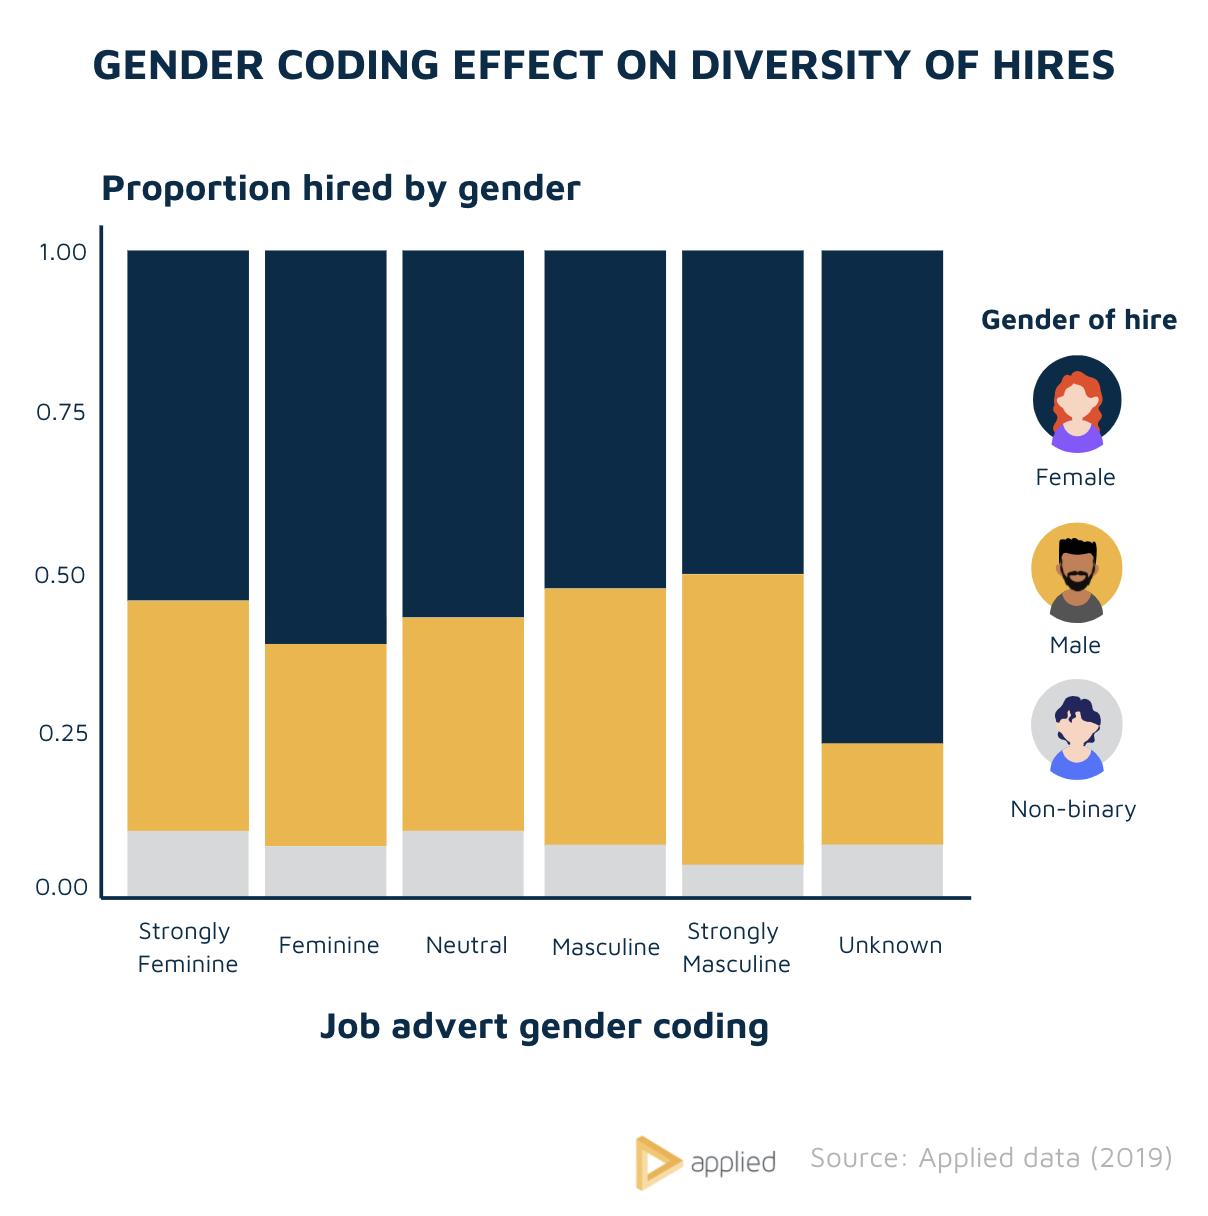 Gender coding effect on diversity chart